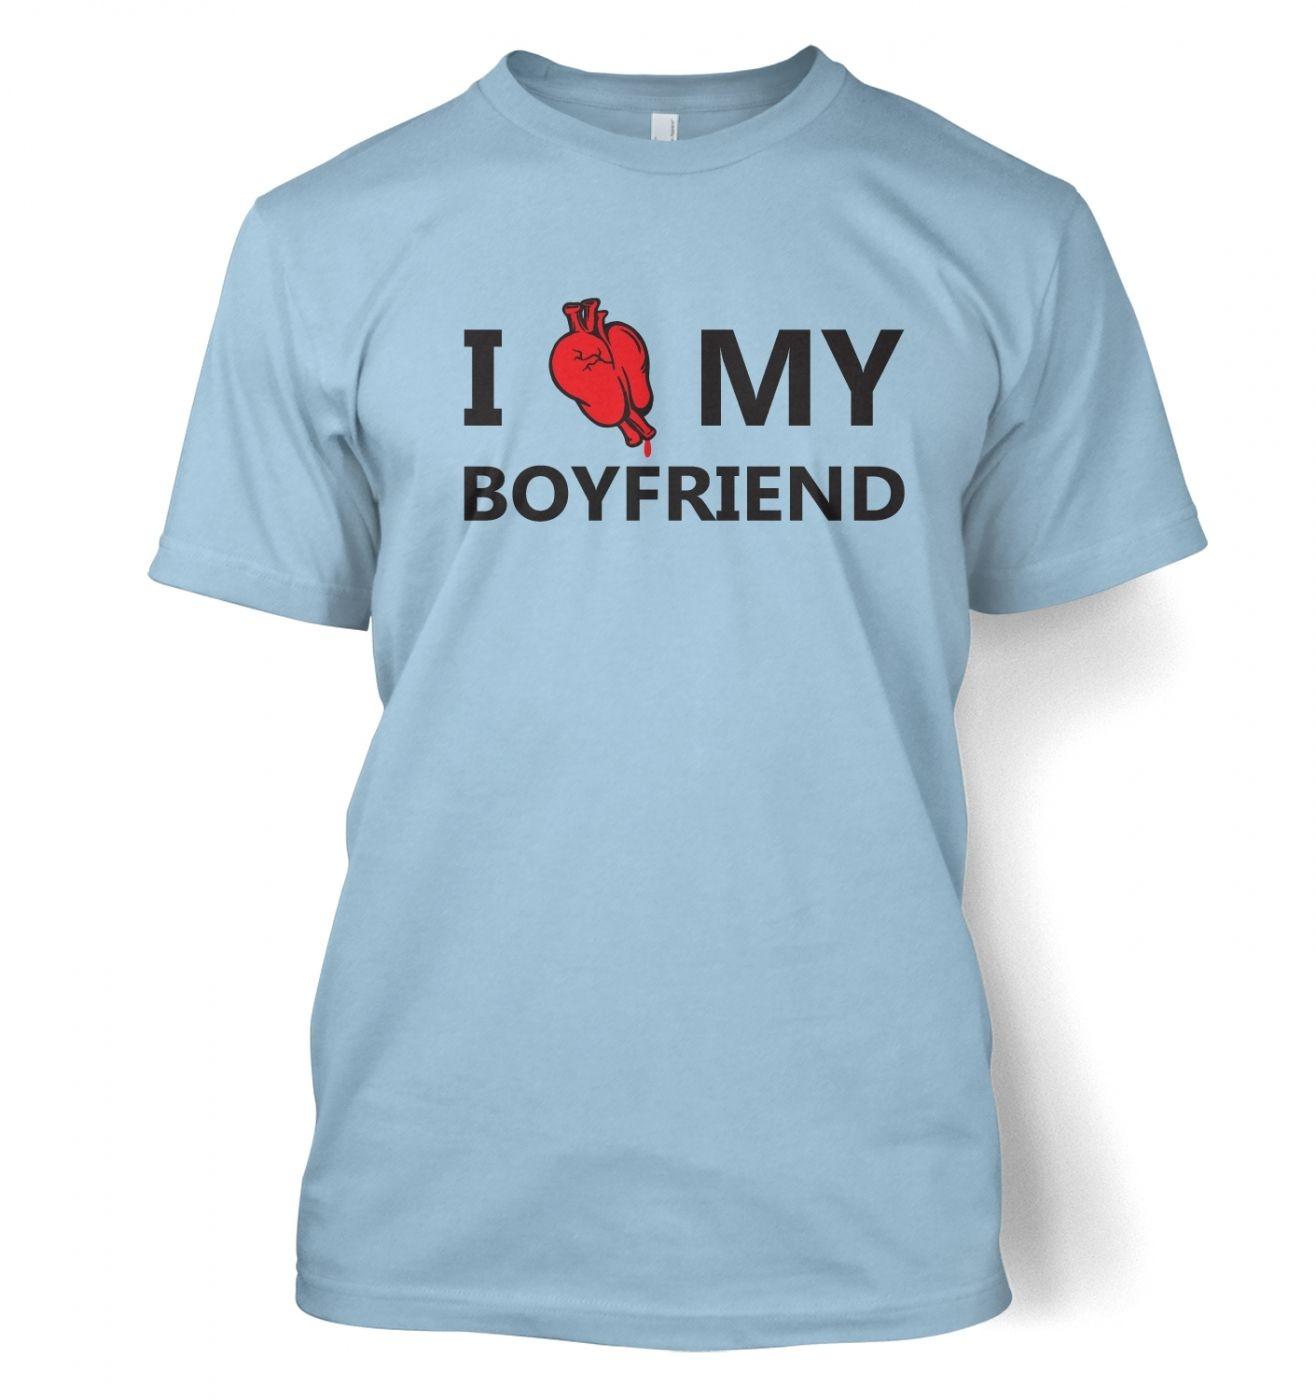 I real heart my boyfriend t-shirt